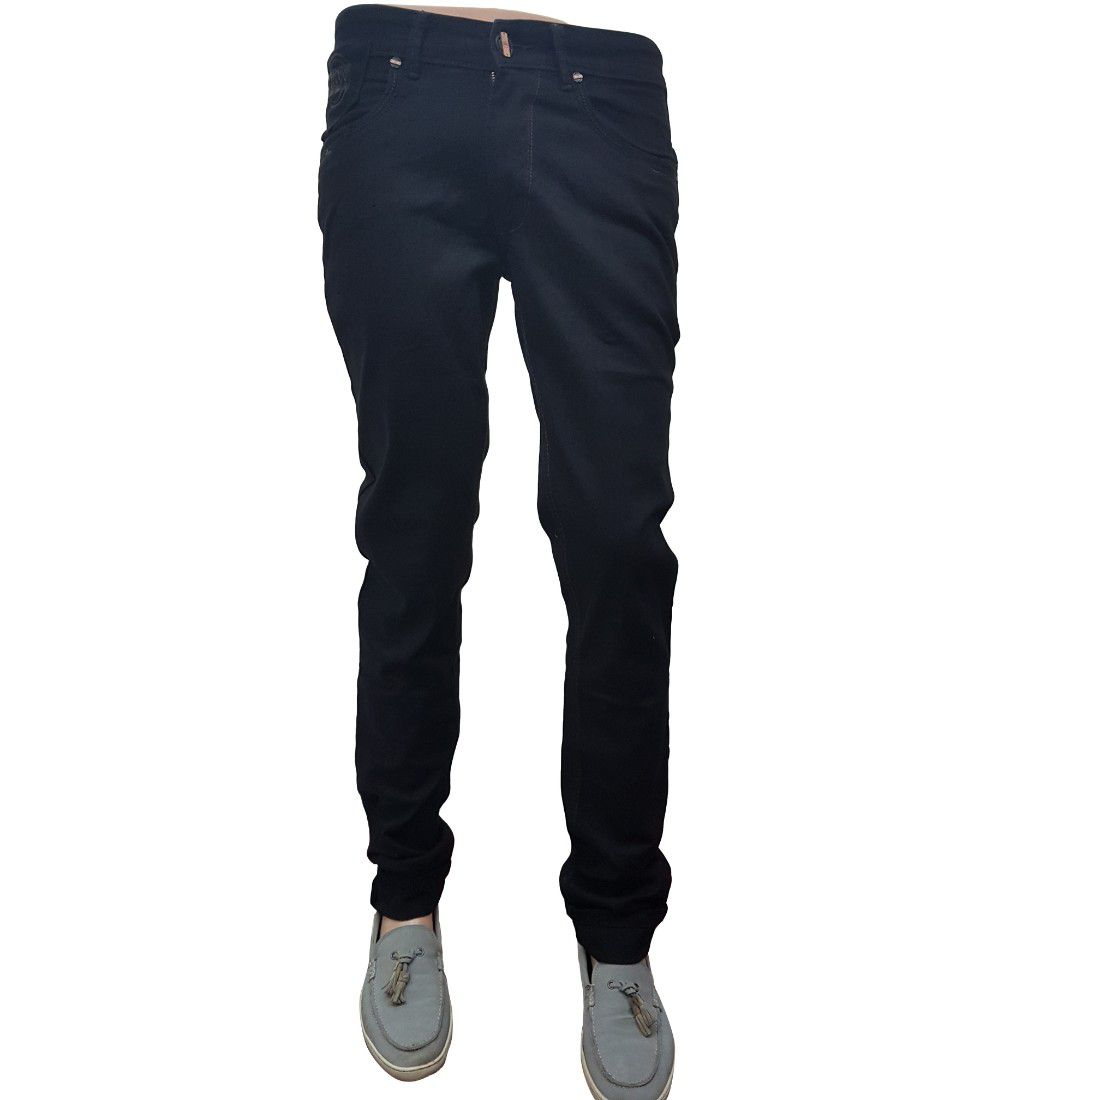 ZIPIT Black Slim Jeans